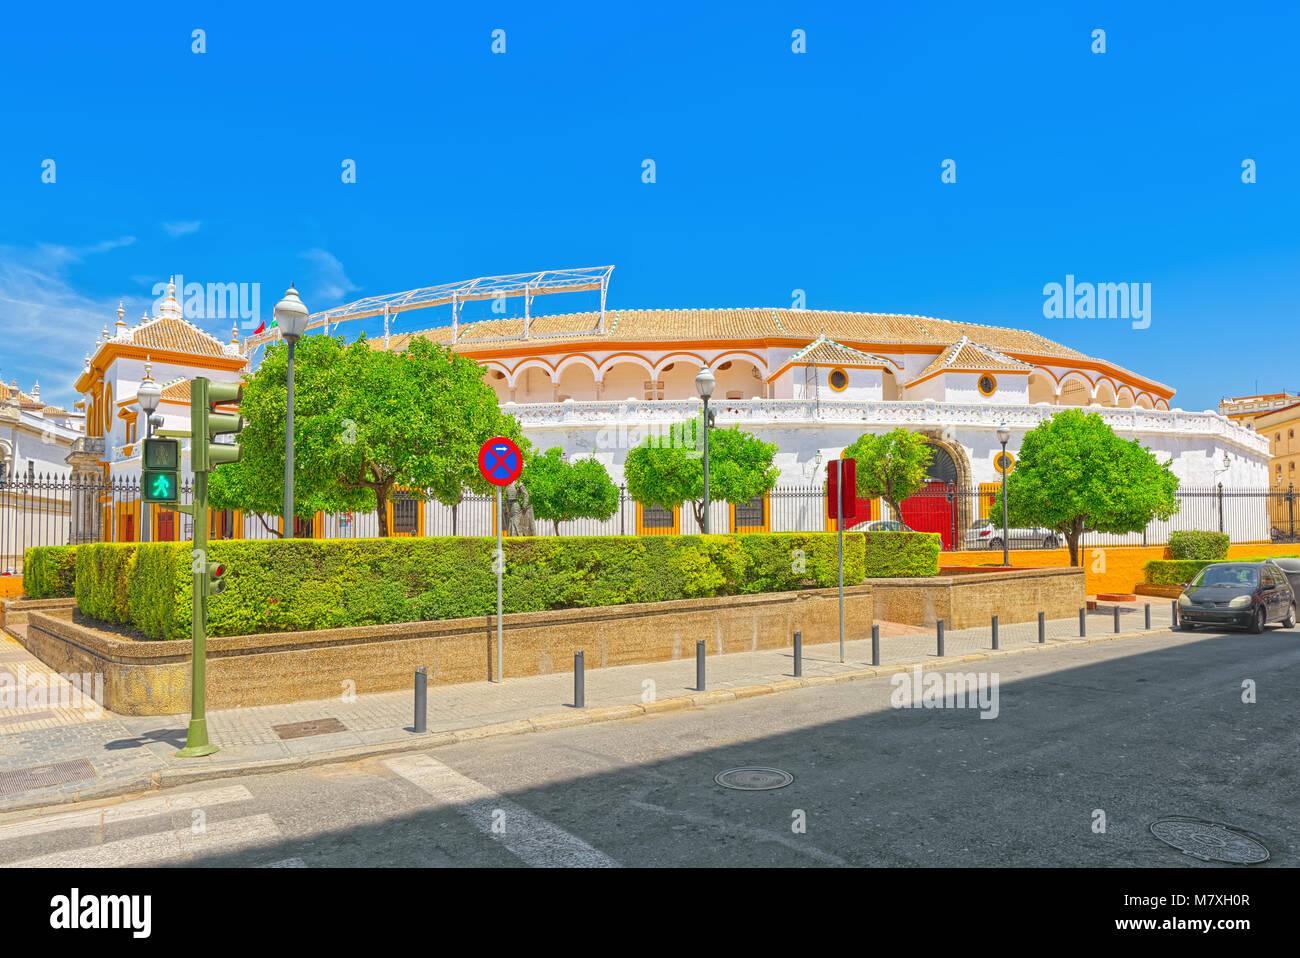 Outdoor view of Arena on of Square of bulls Royal Maestranza of Cavalry in Seville.(Plaza de toros de la Real Maestranza - Stock Image